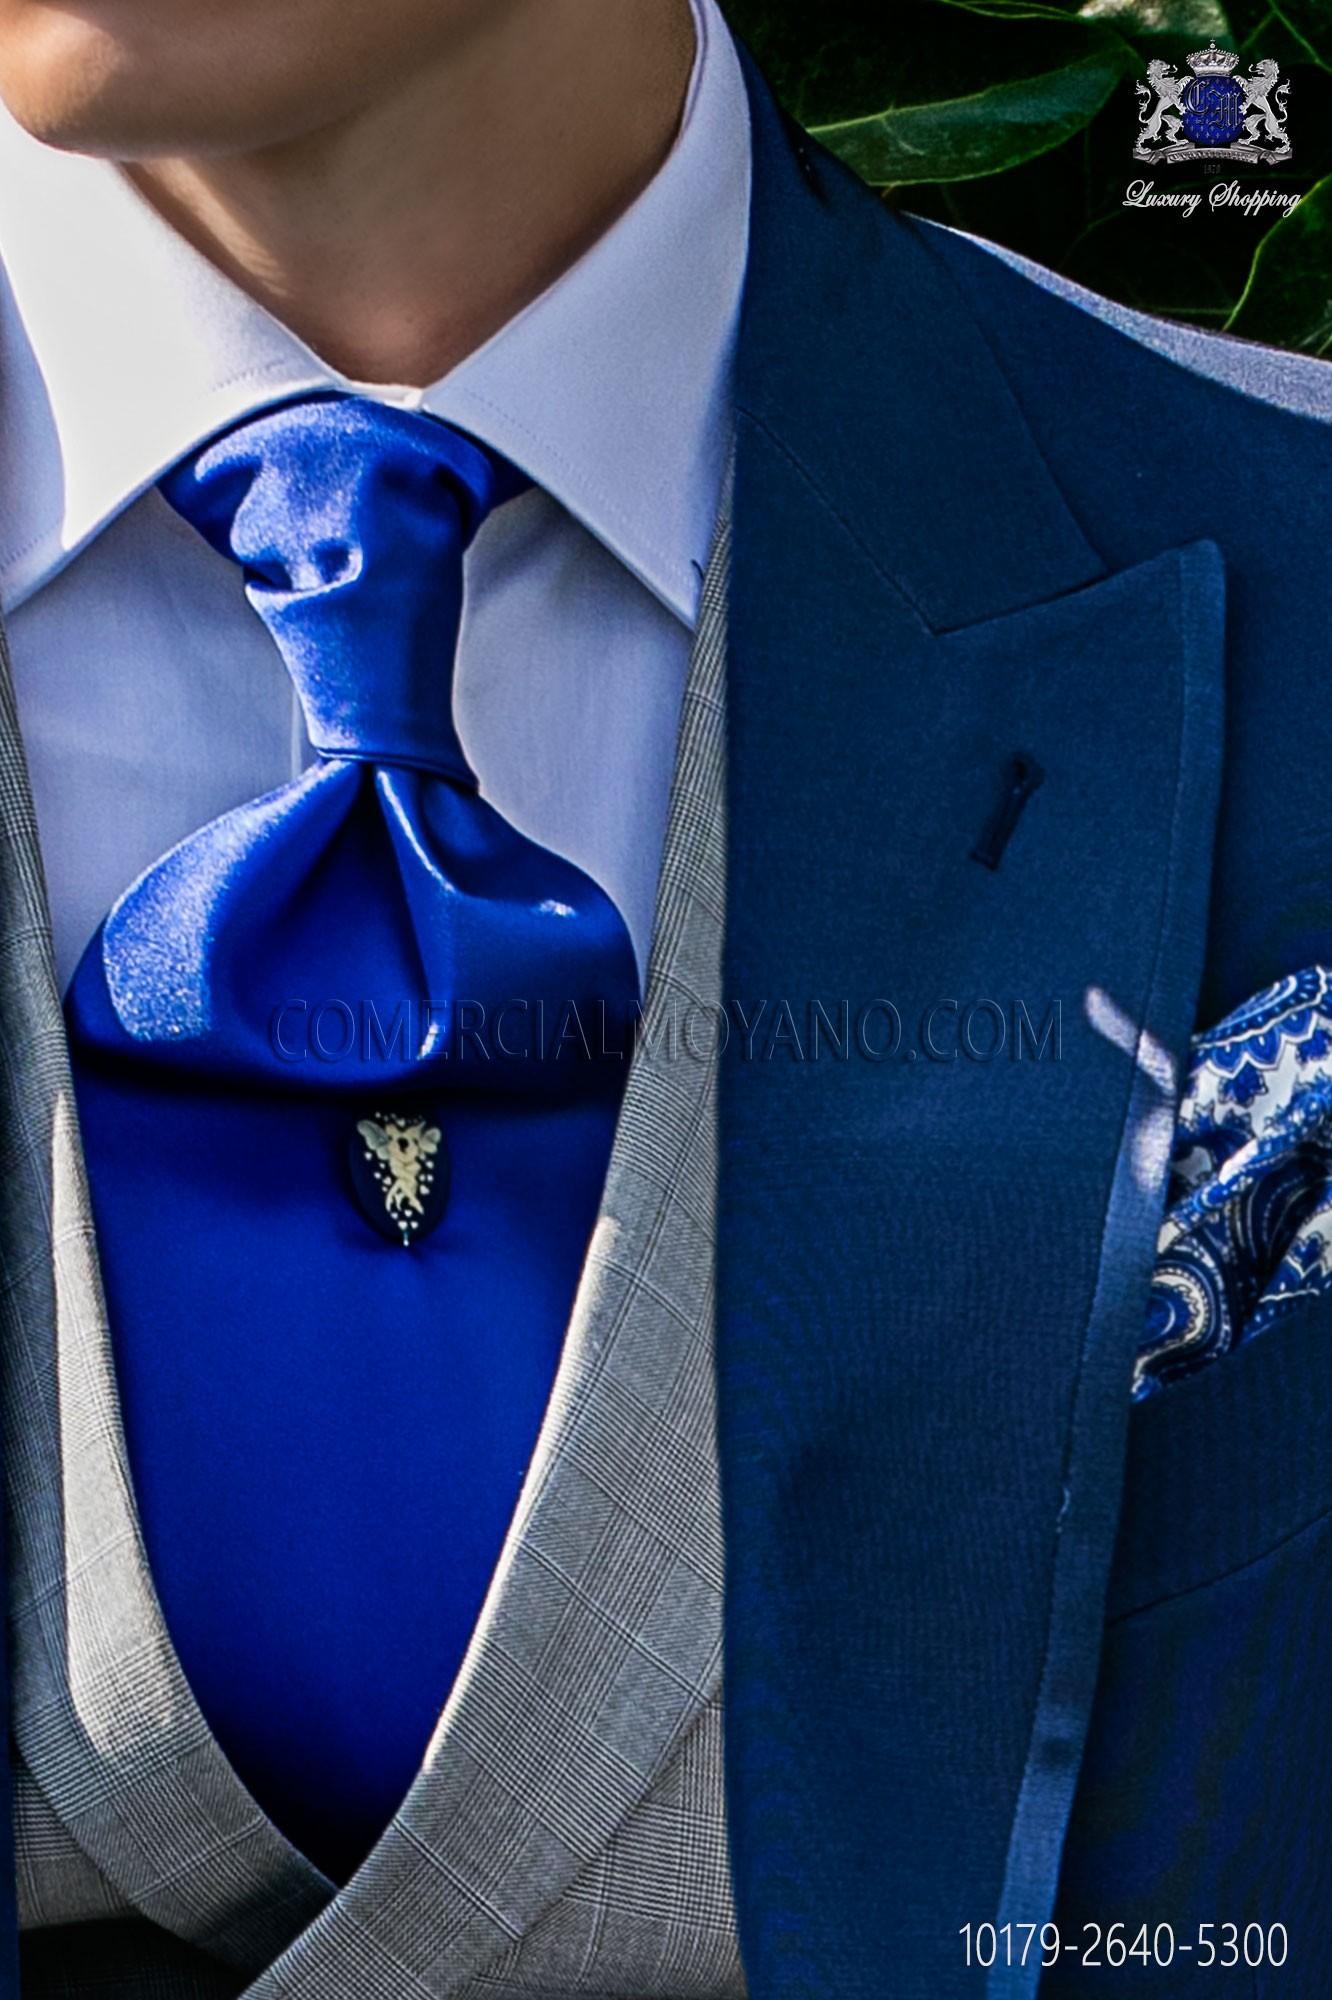 640a4bf5126b ... White Polka Dots Loading Zoom. Royal Blue Ascot Tie Ottavio Nuccio Gala